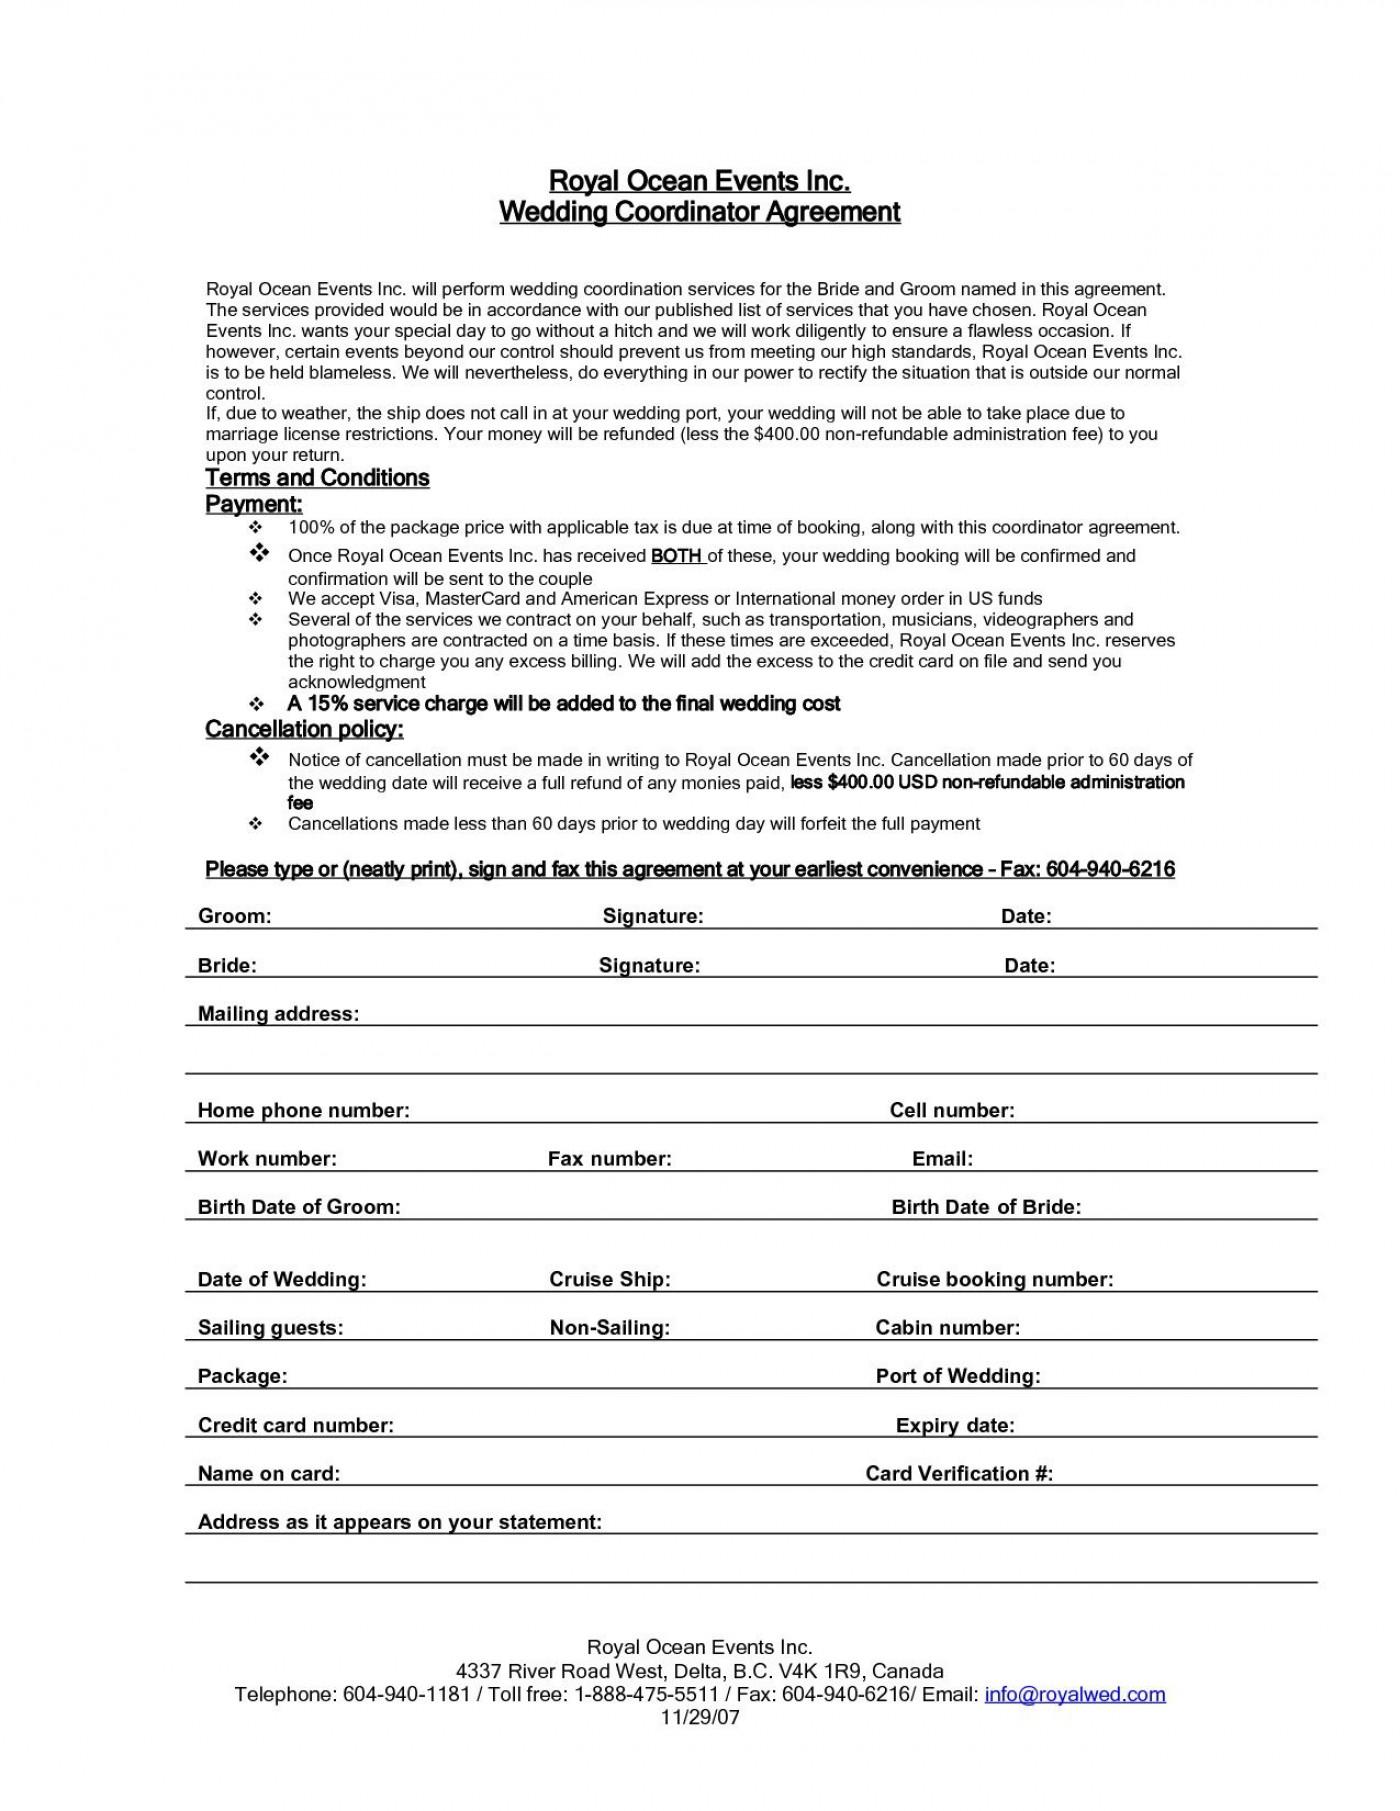 005 Impressive Wedding Planner Contract Template Picture  Uk Australia1400